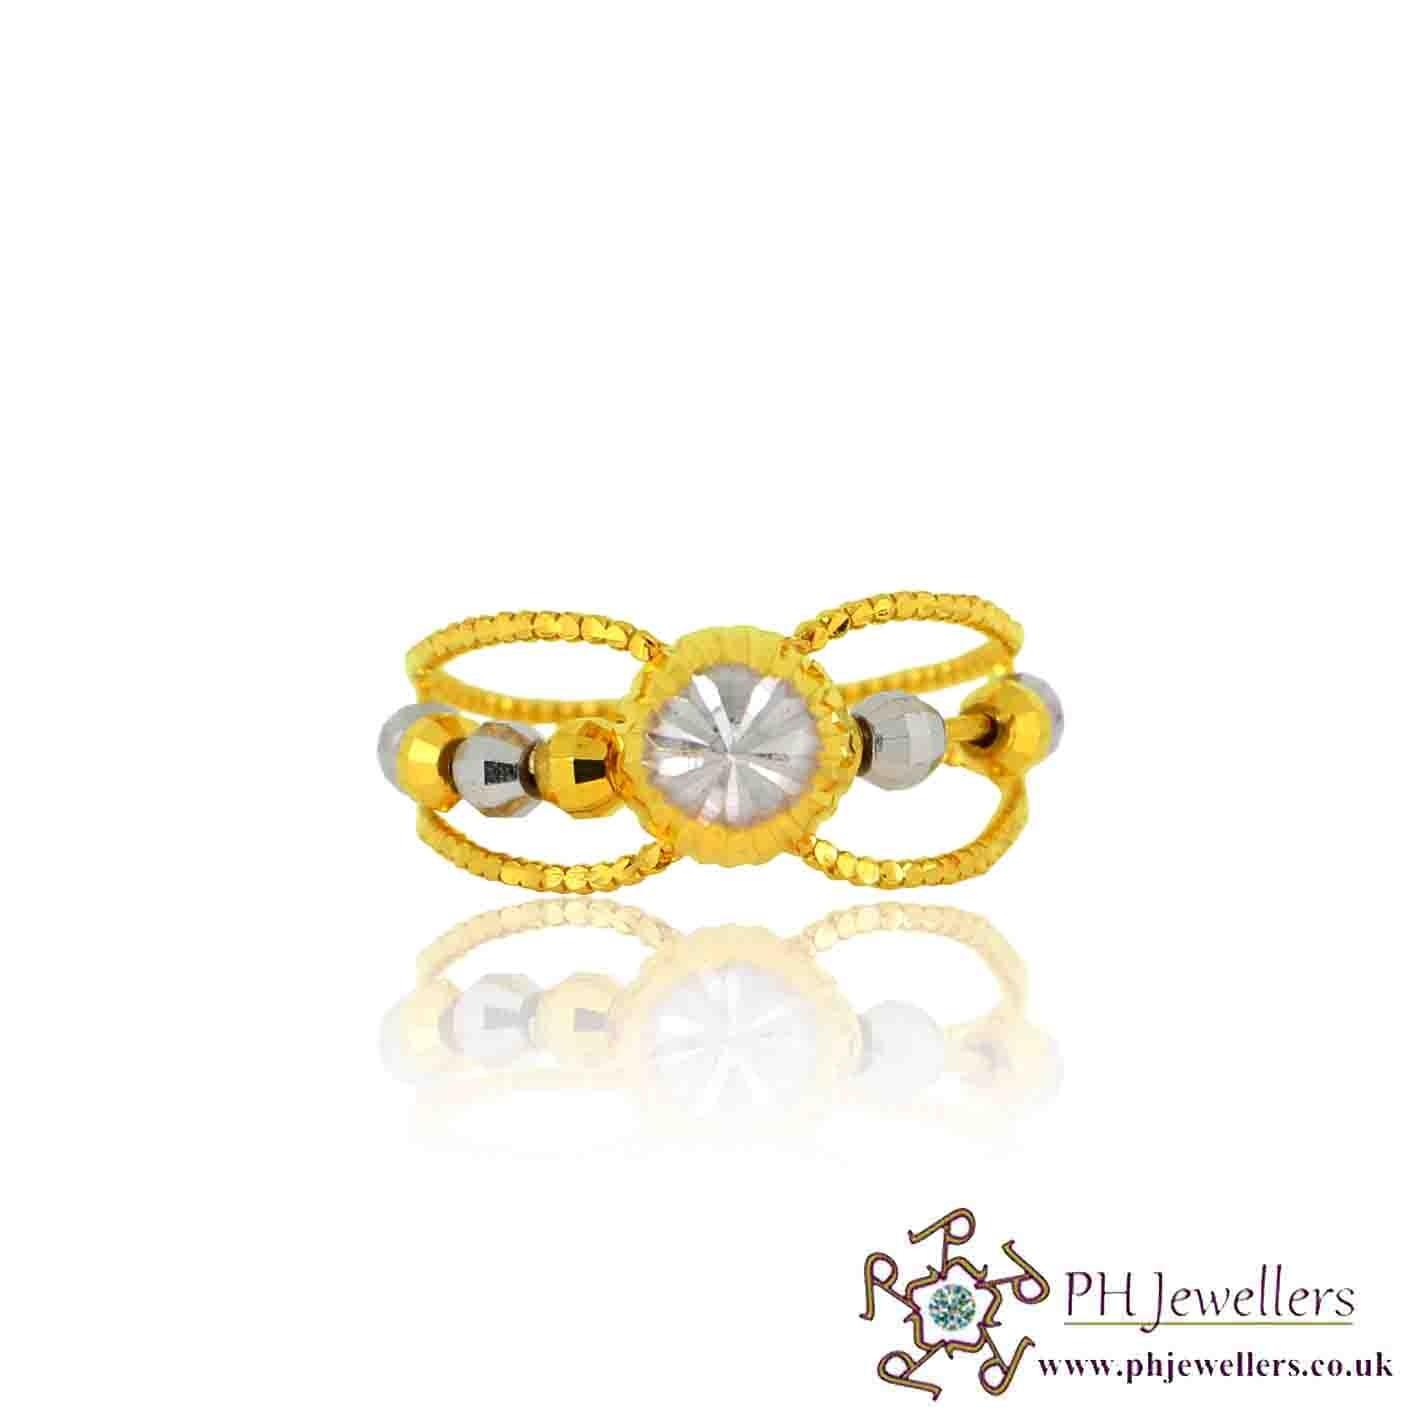 22ct 916 Hallmark Yellow Gold Size K Rhodium Ring PR29